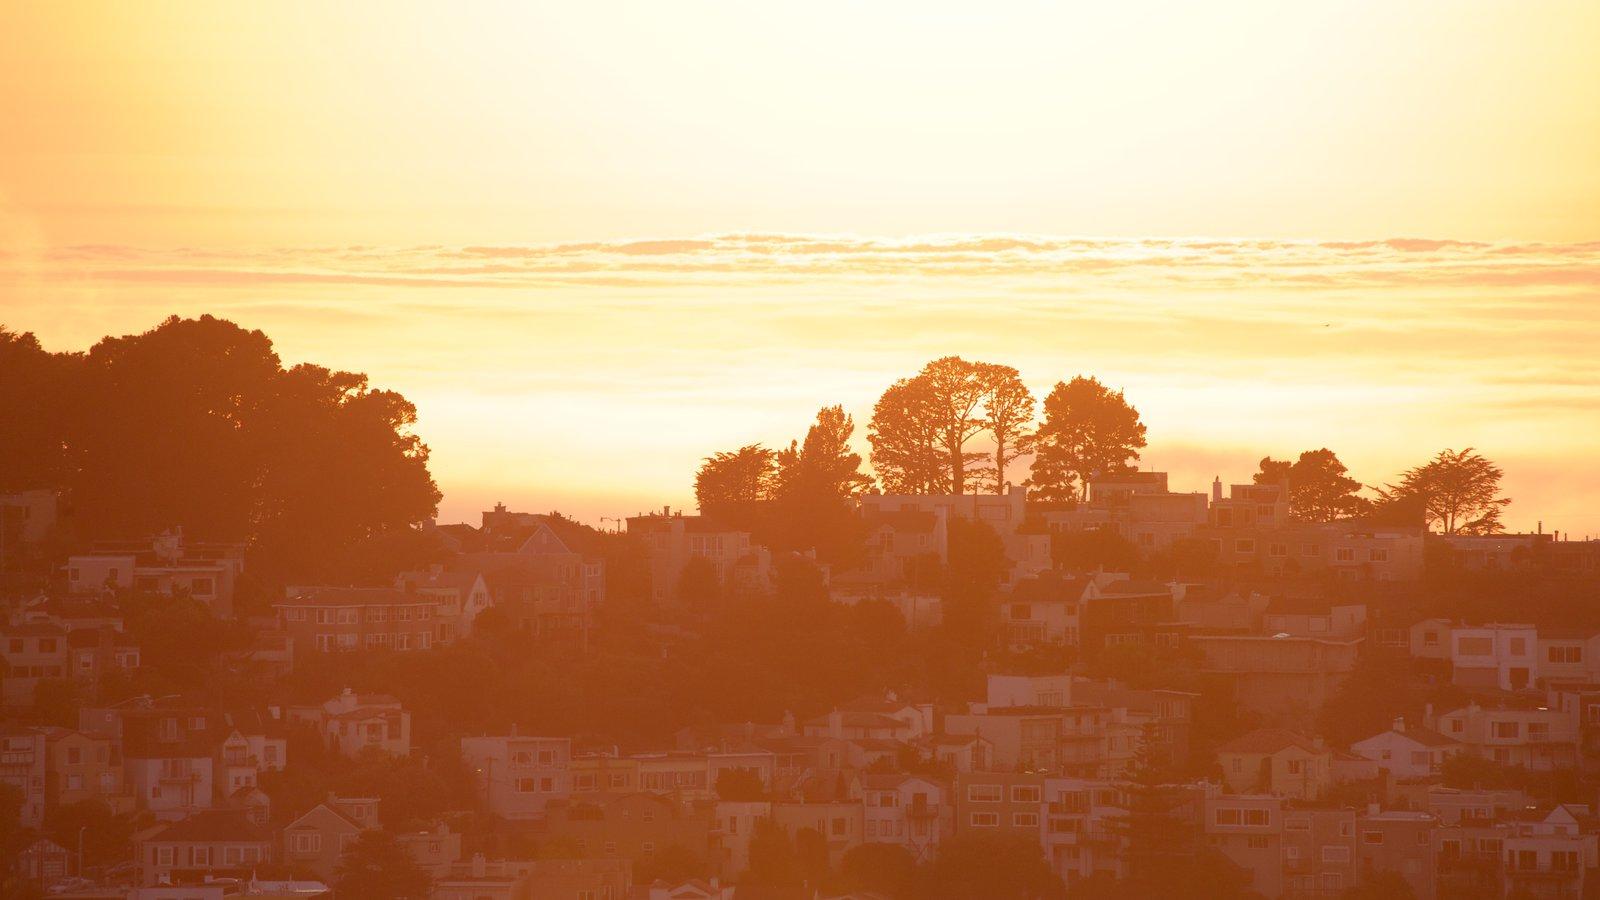 Twin Peaks caracterizando um pôr do sol